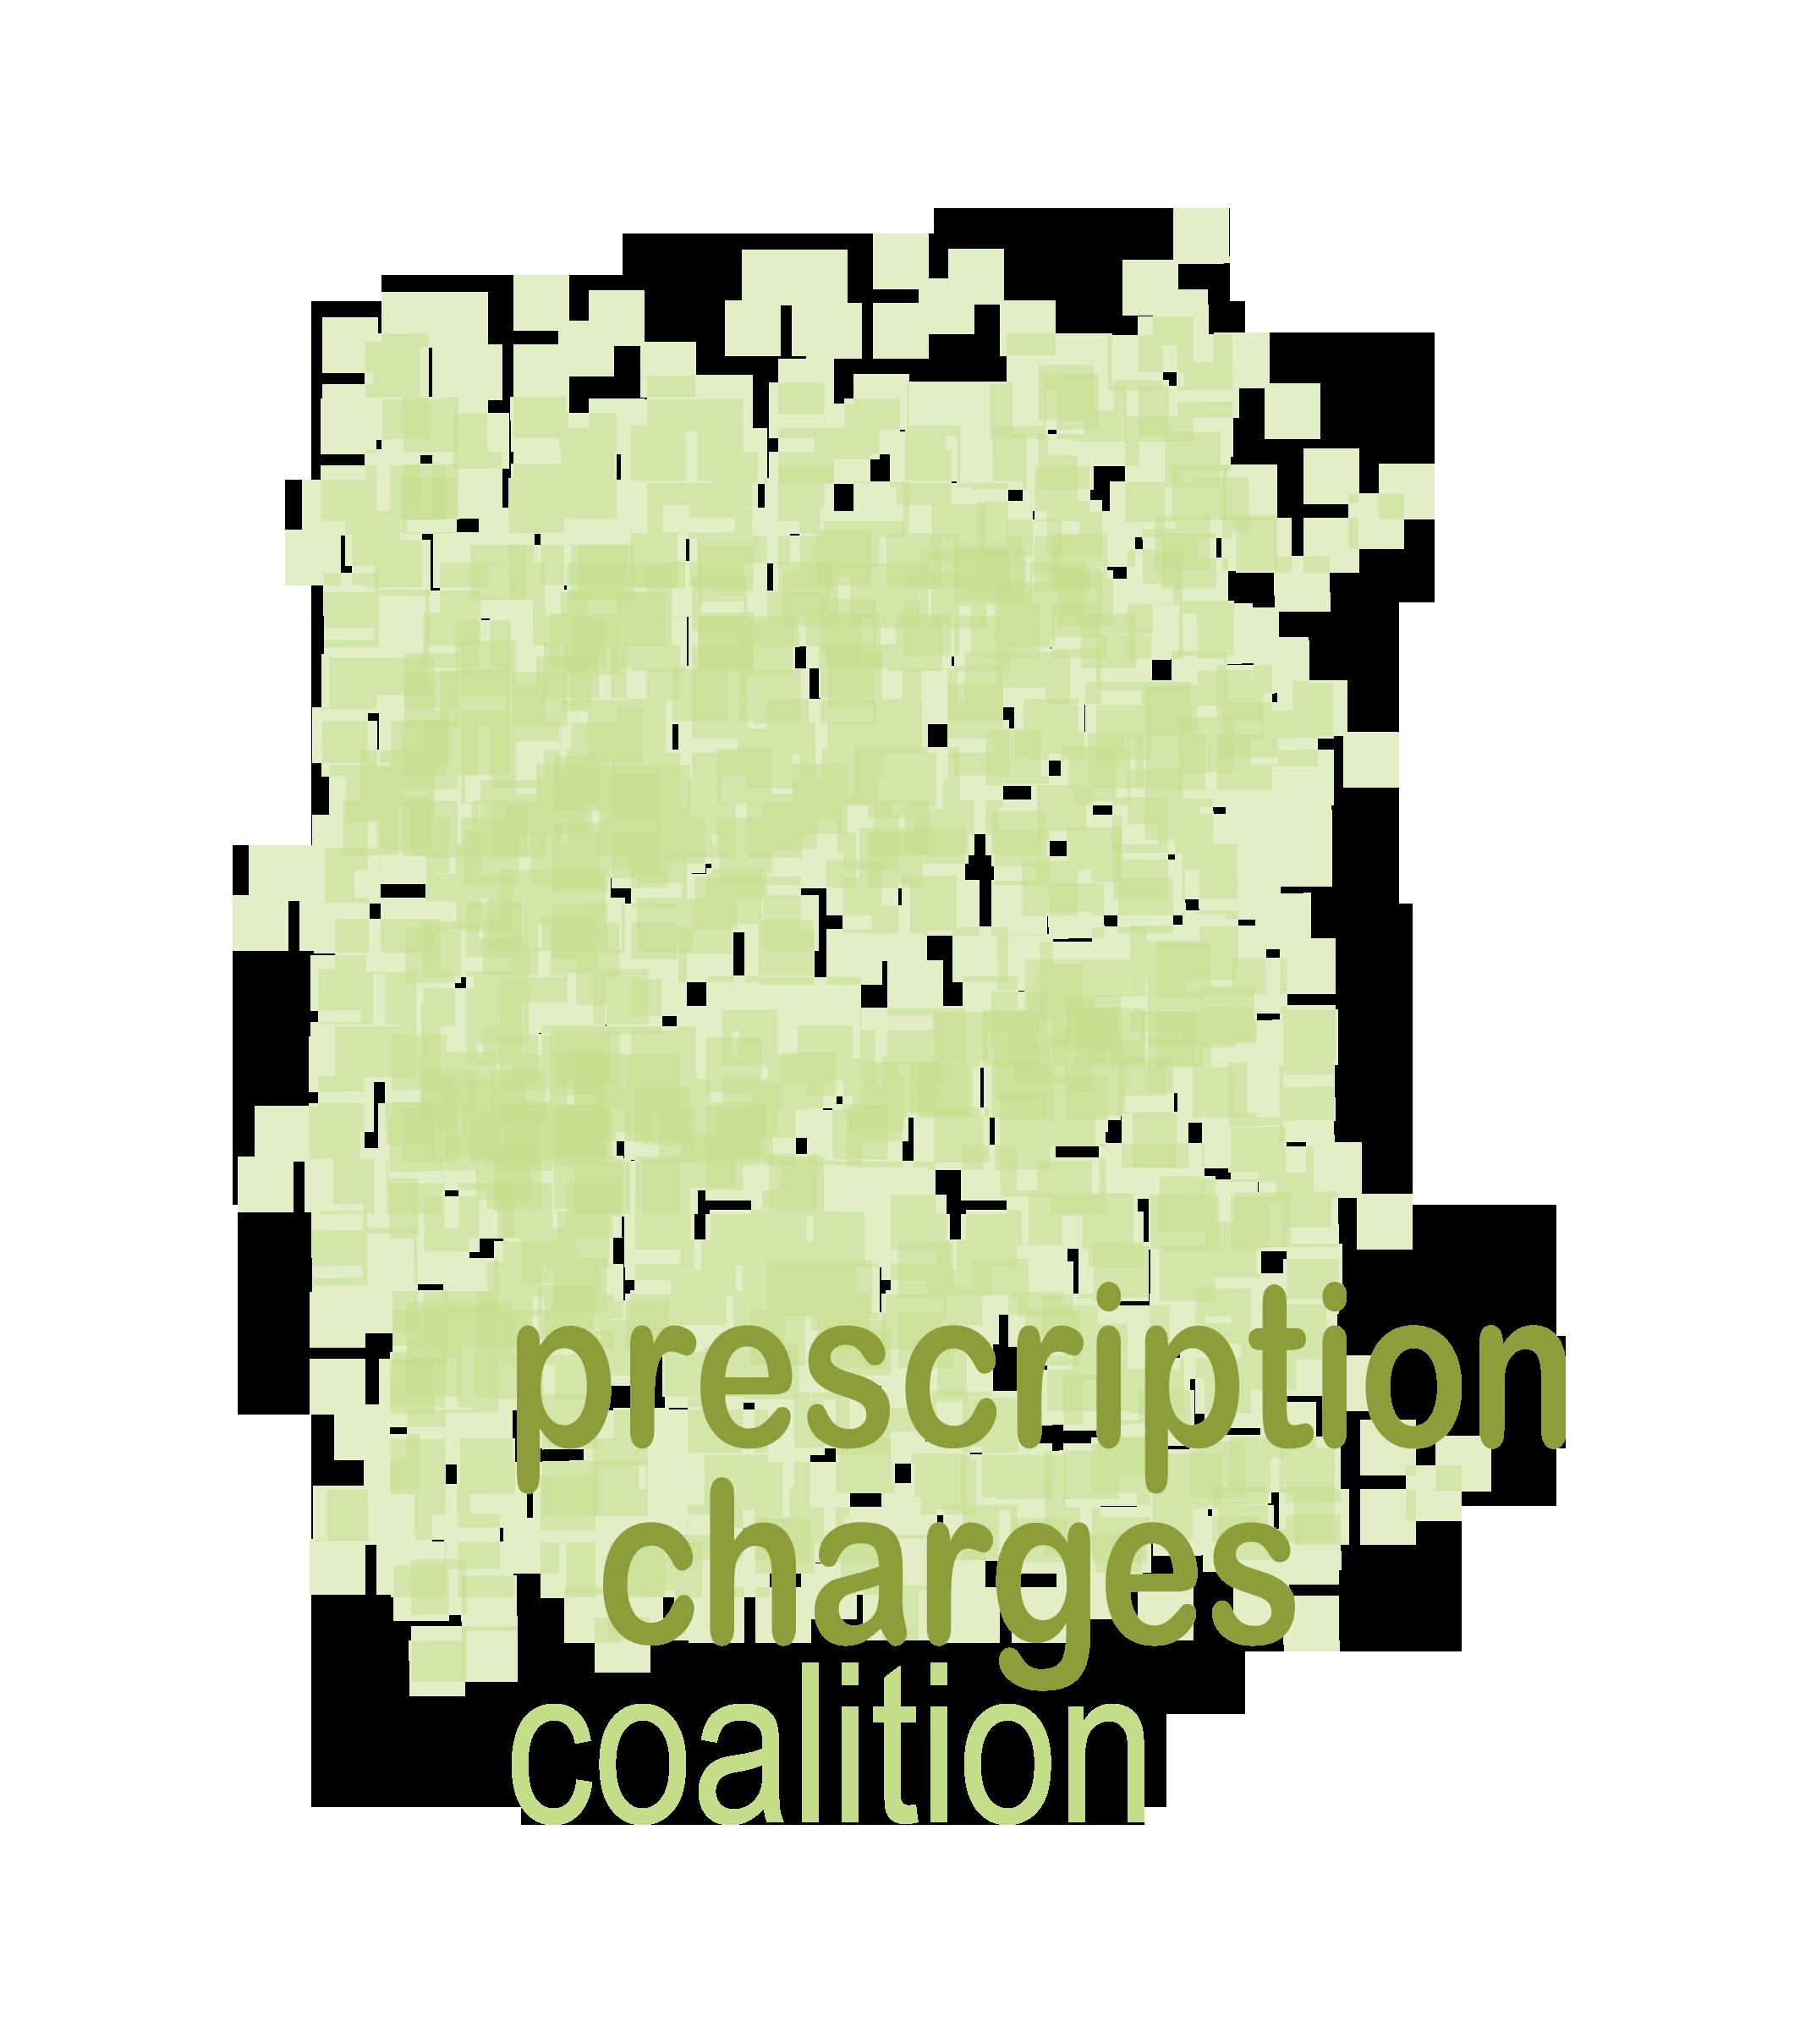 CS2217-Prescription-Charges-Coalition-logo-MASTER